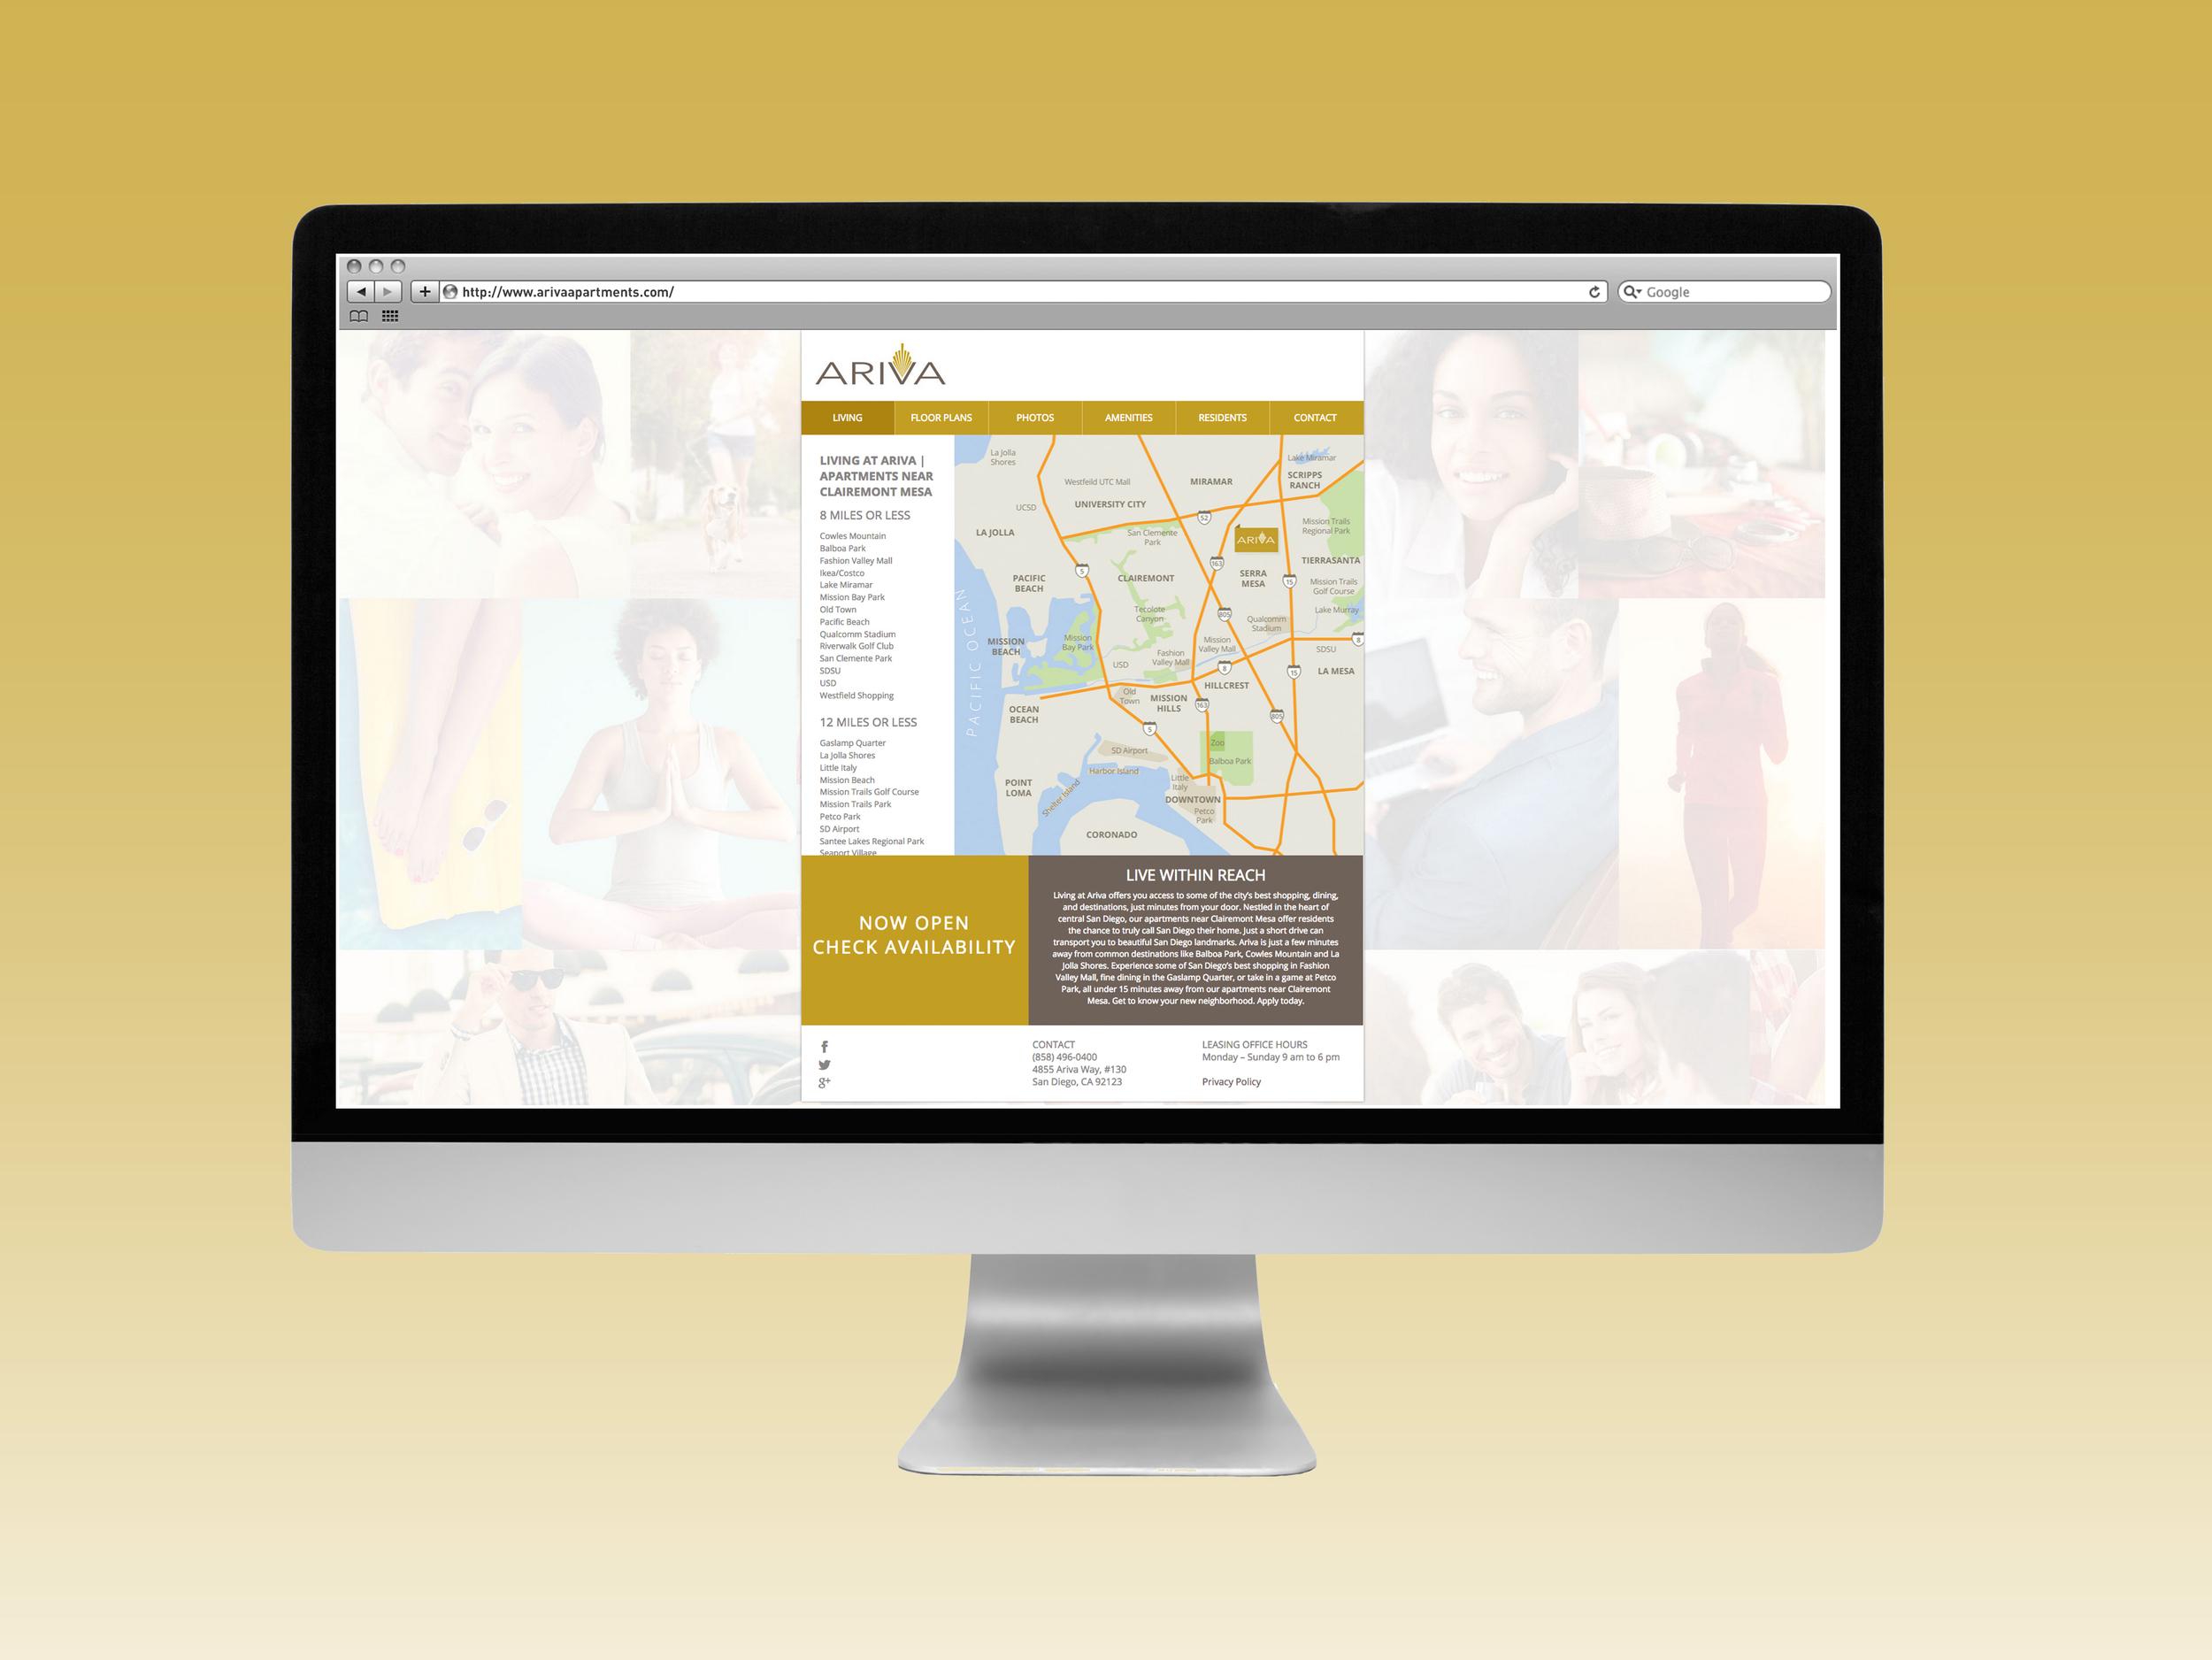 ARIVA_Website_web1 Location.jpg